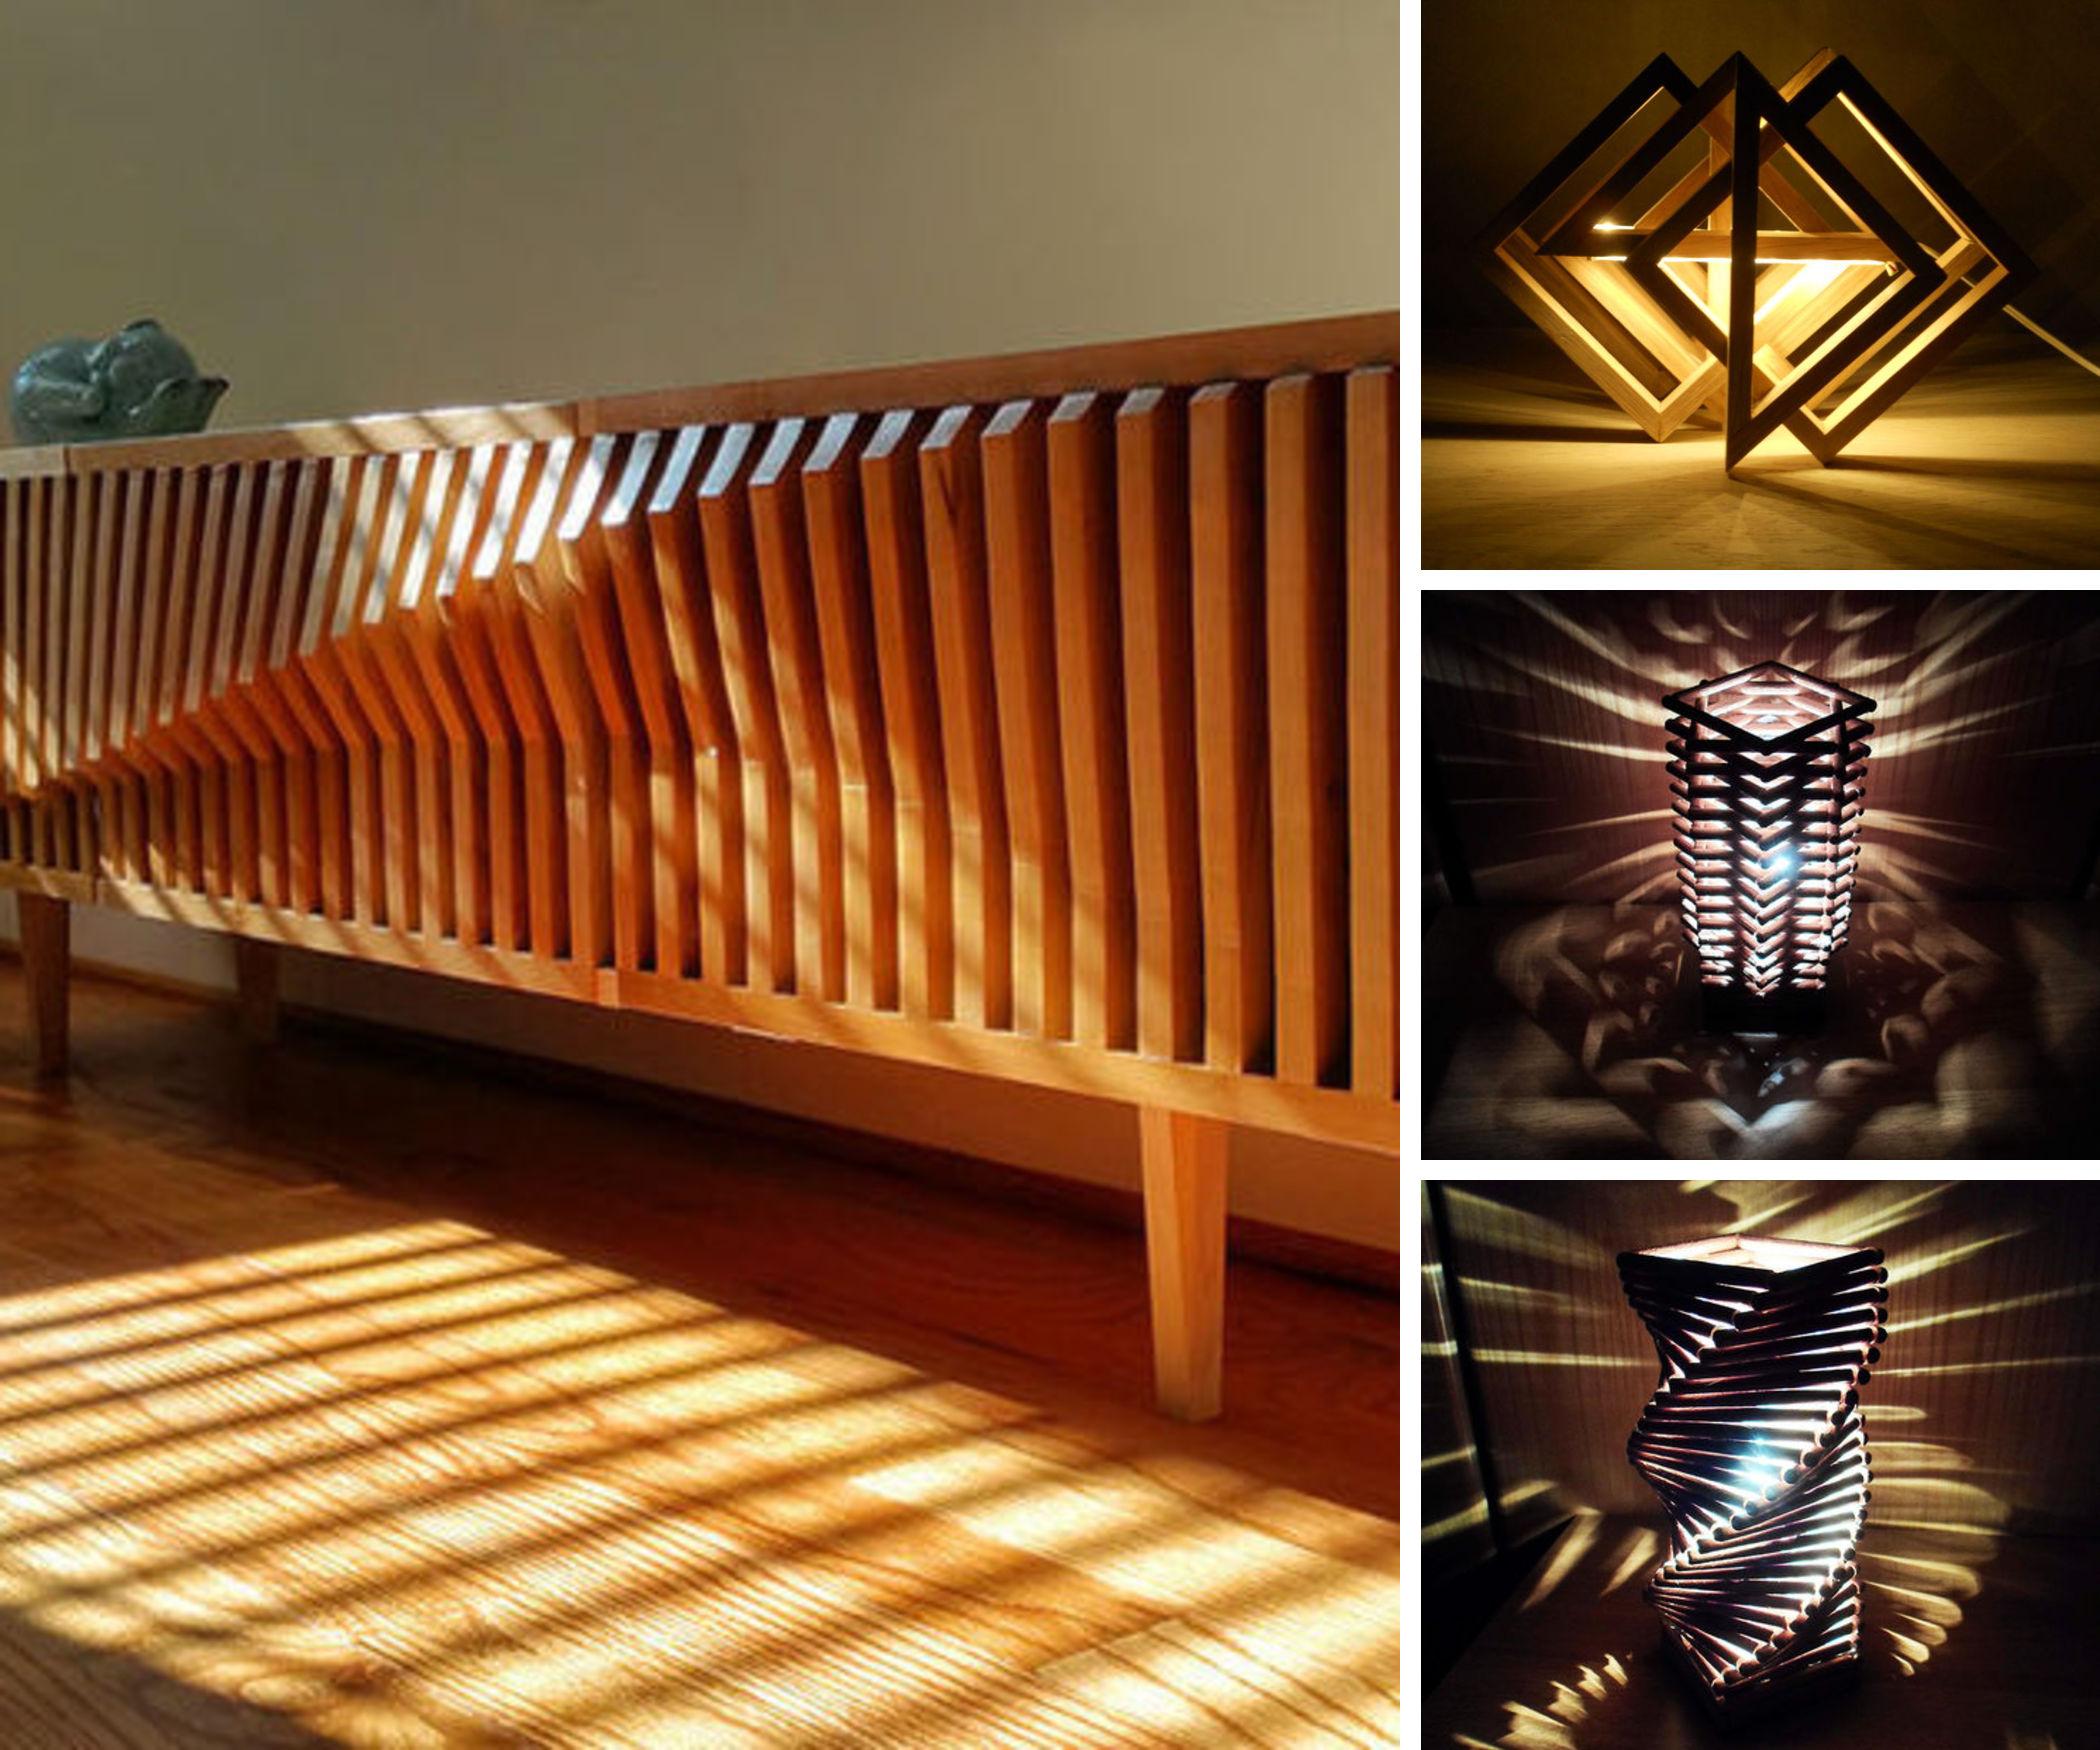 geometry meets furniture